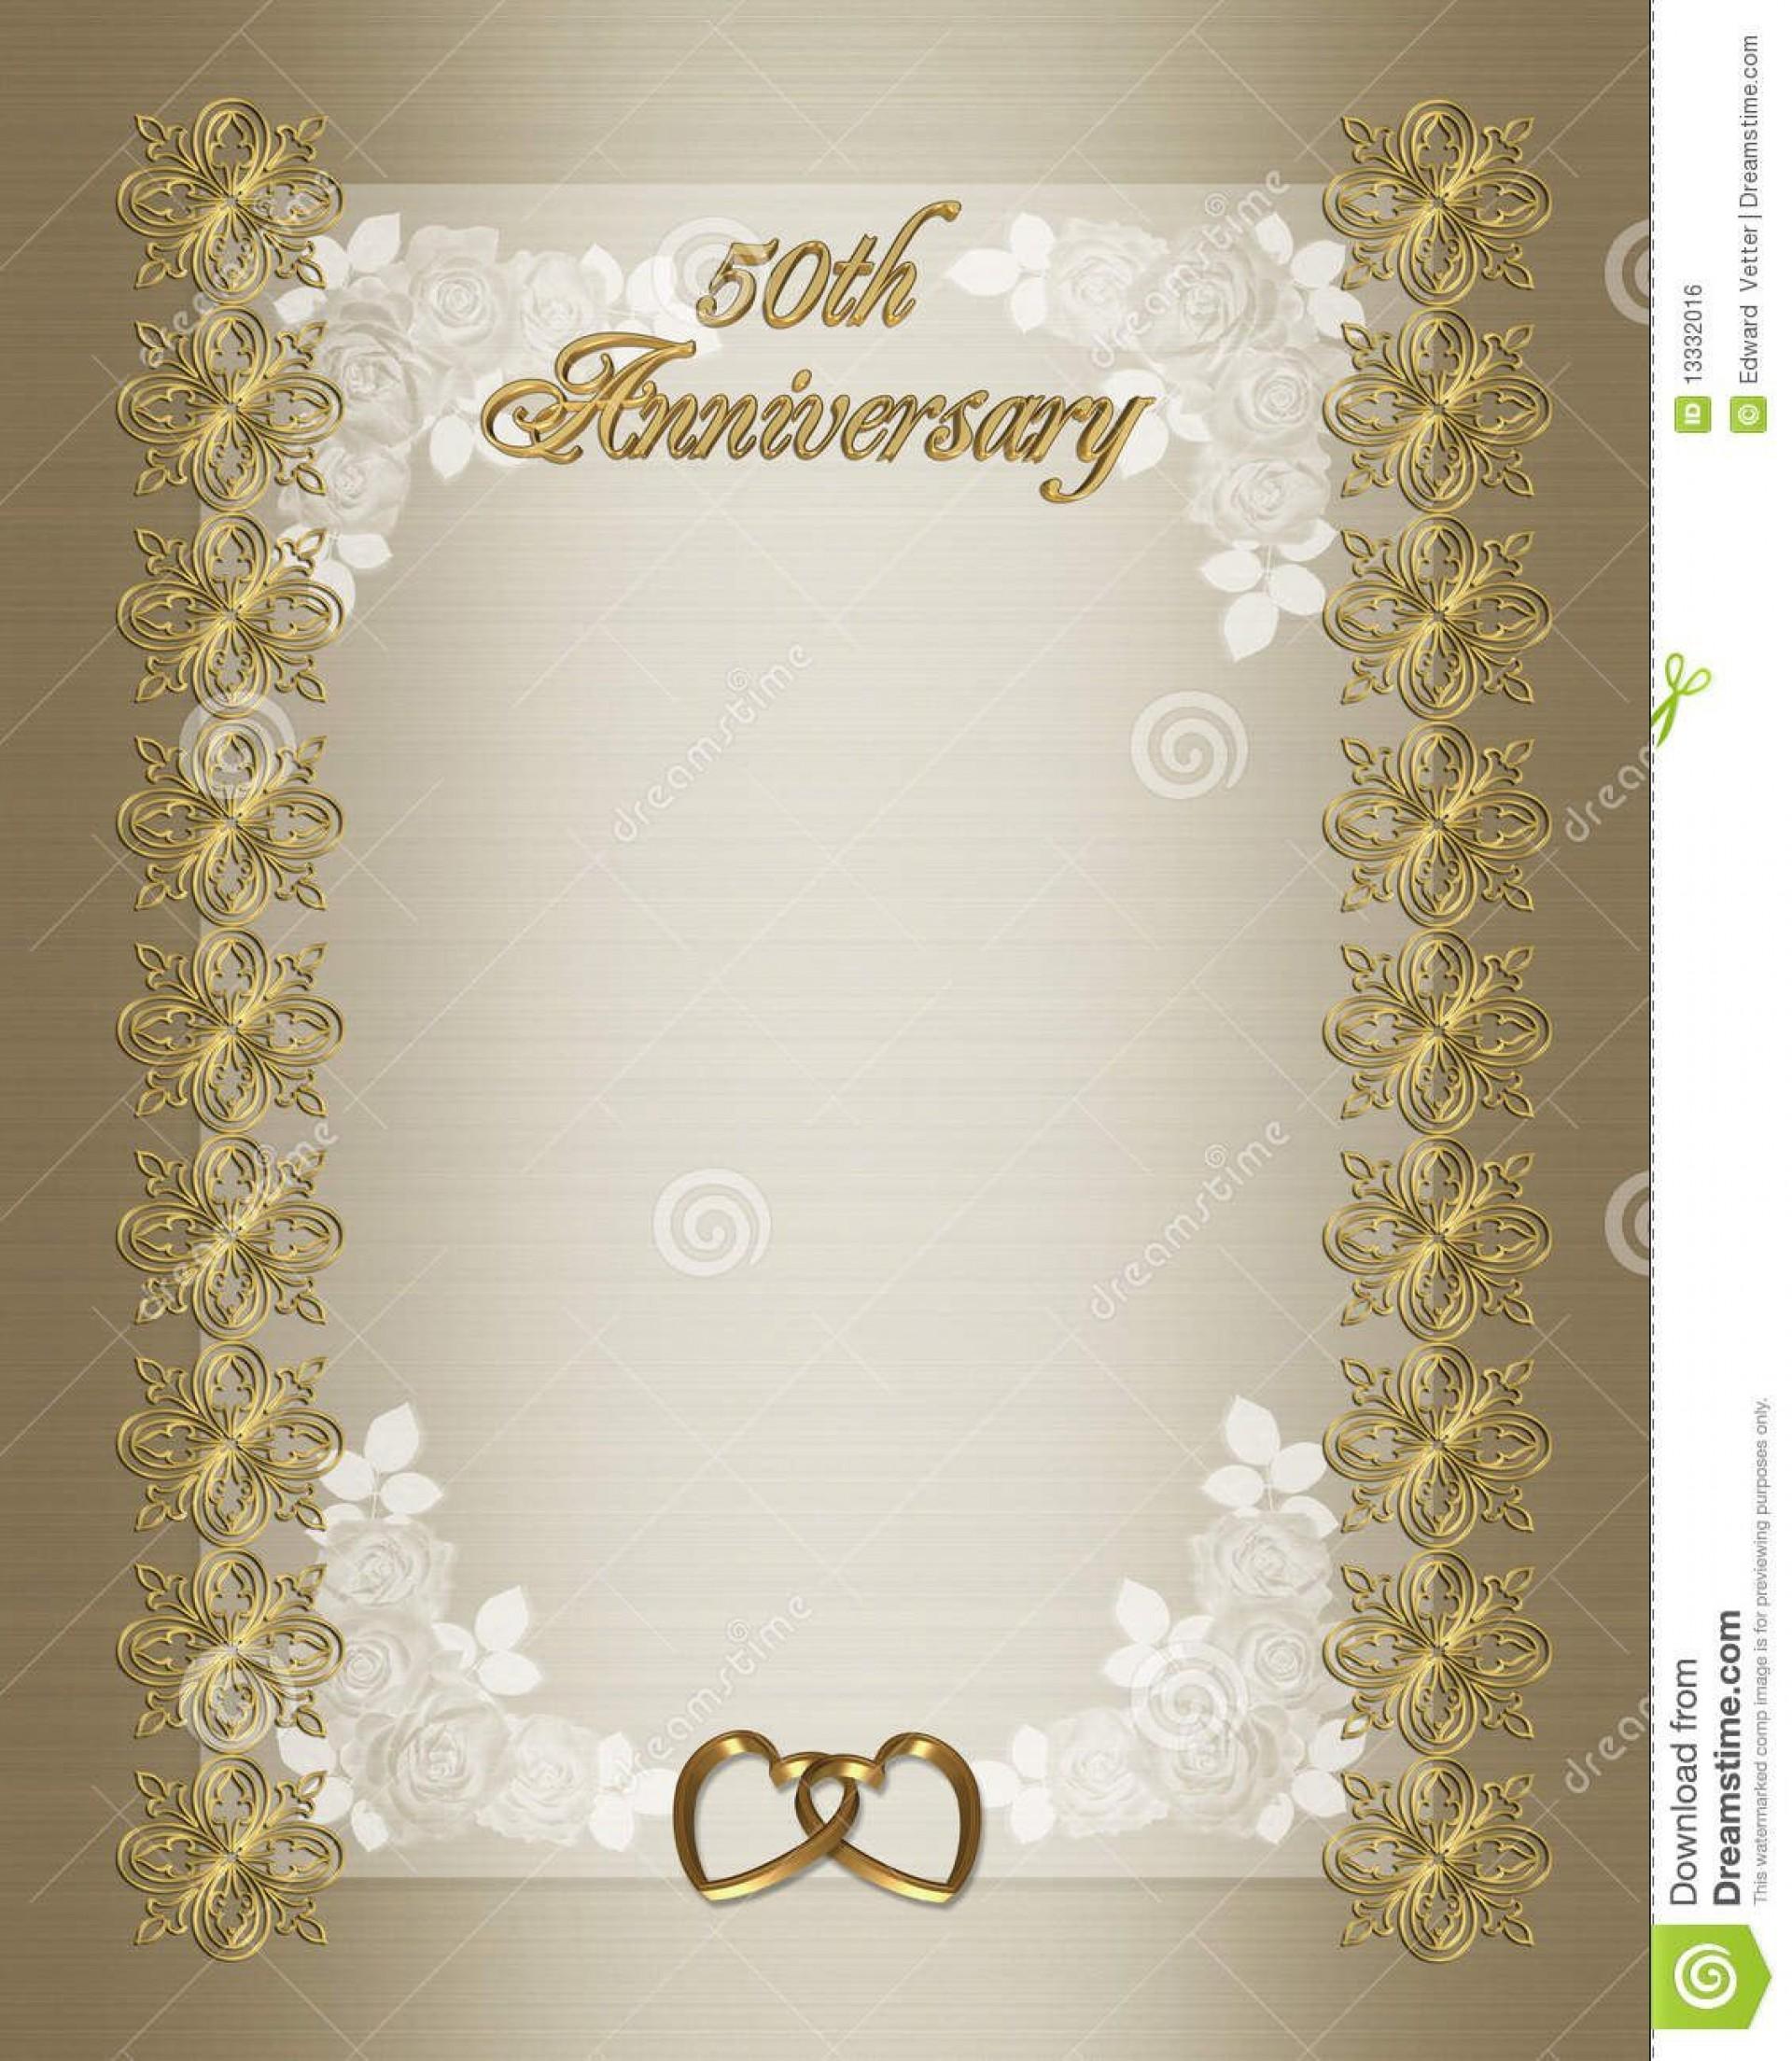 001 Awesome 50th Wedding Anniversary Invitation Template Microsoft Word High Resolution  Free1920